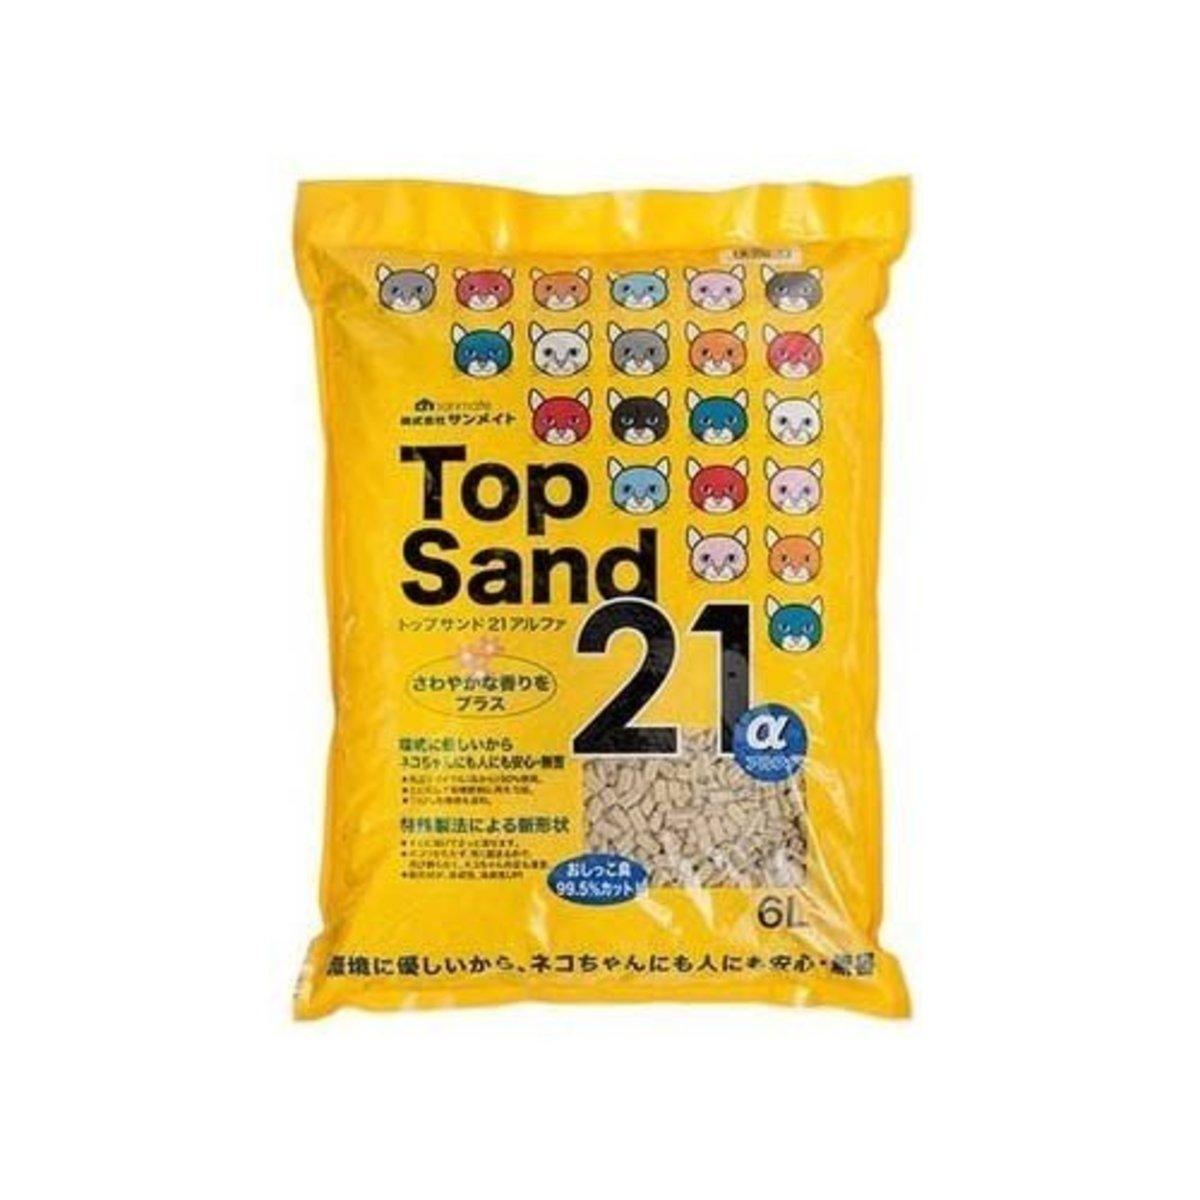 Top Sand 21α空心雙通豆腐砂6L x6包 (日本進口) (NP-3367_6)